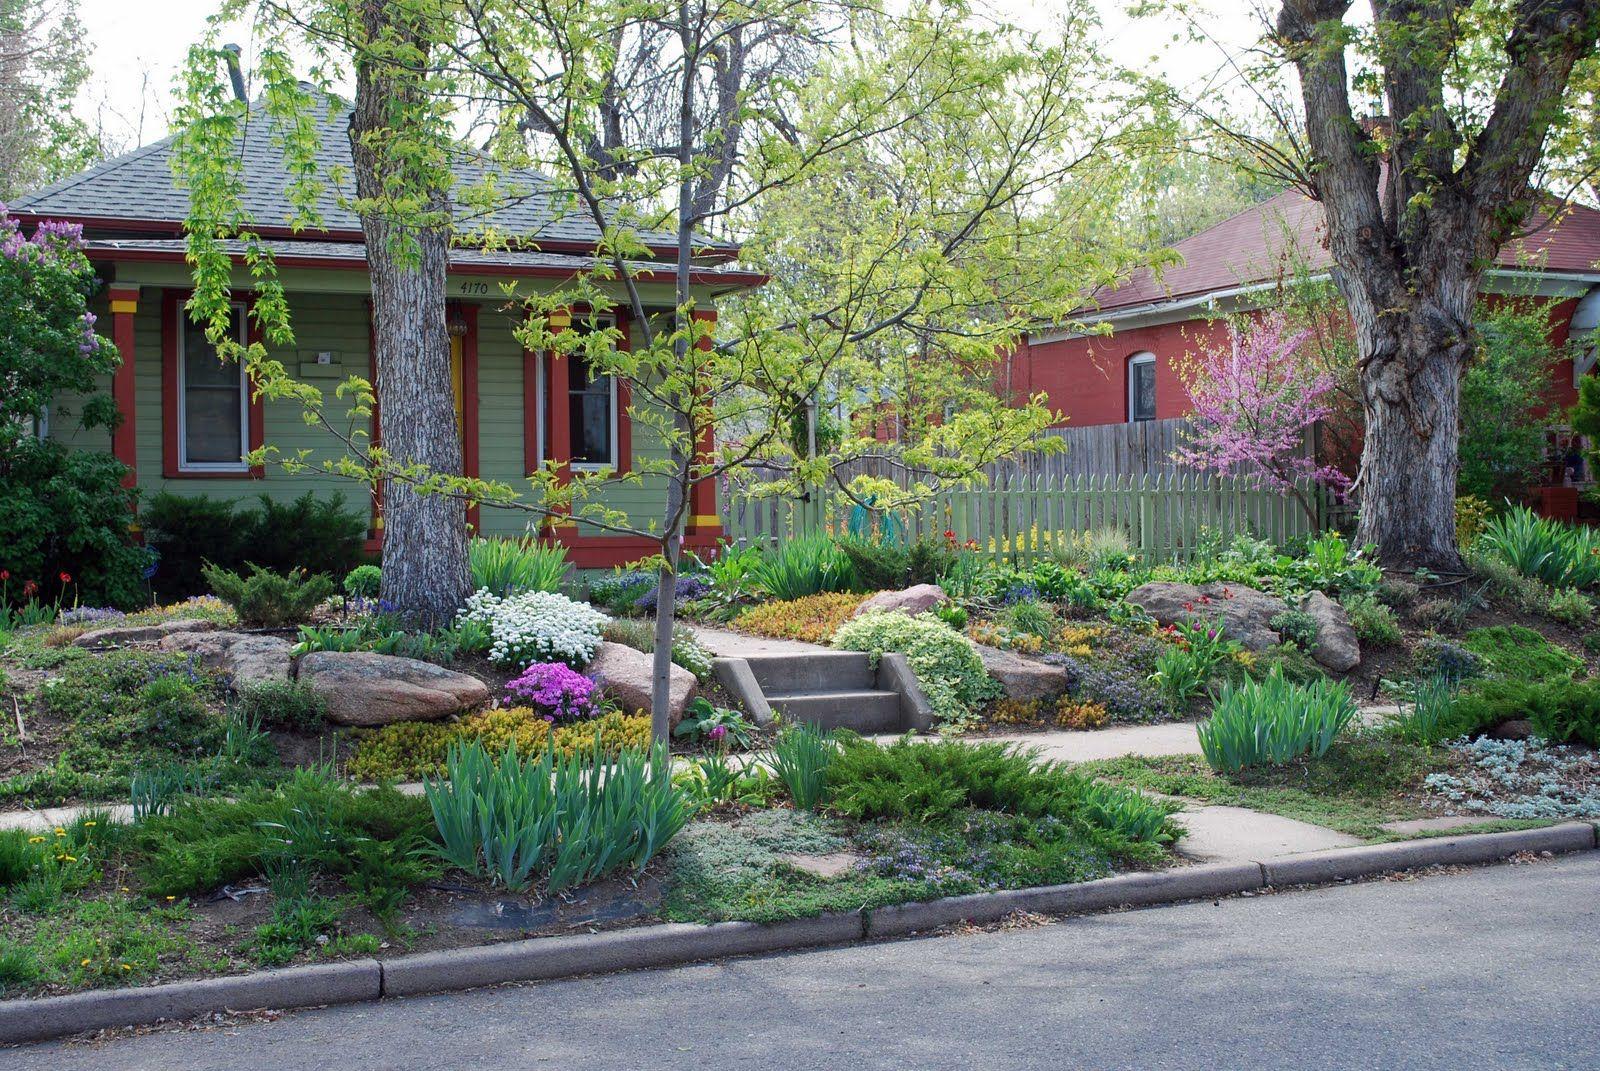 Garden Designers Roundtable Lawn Alternatives The Art Garden - The art of a small yard landscape